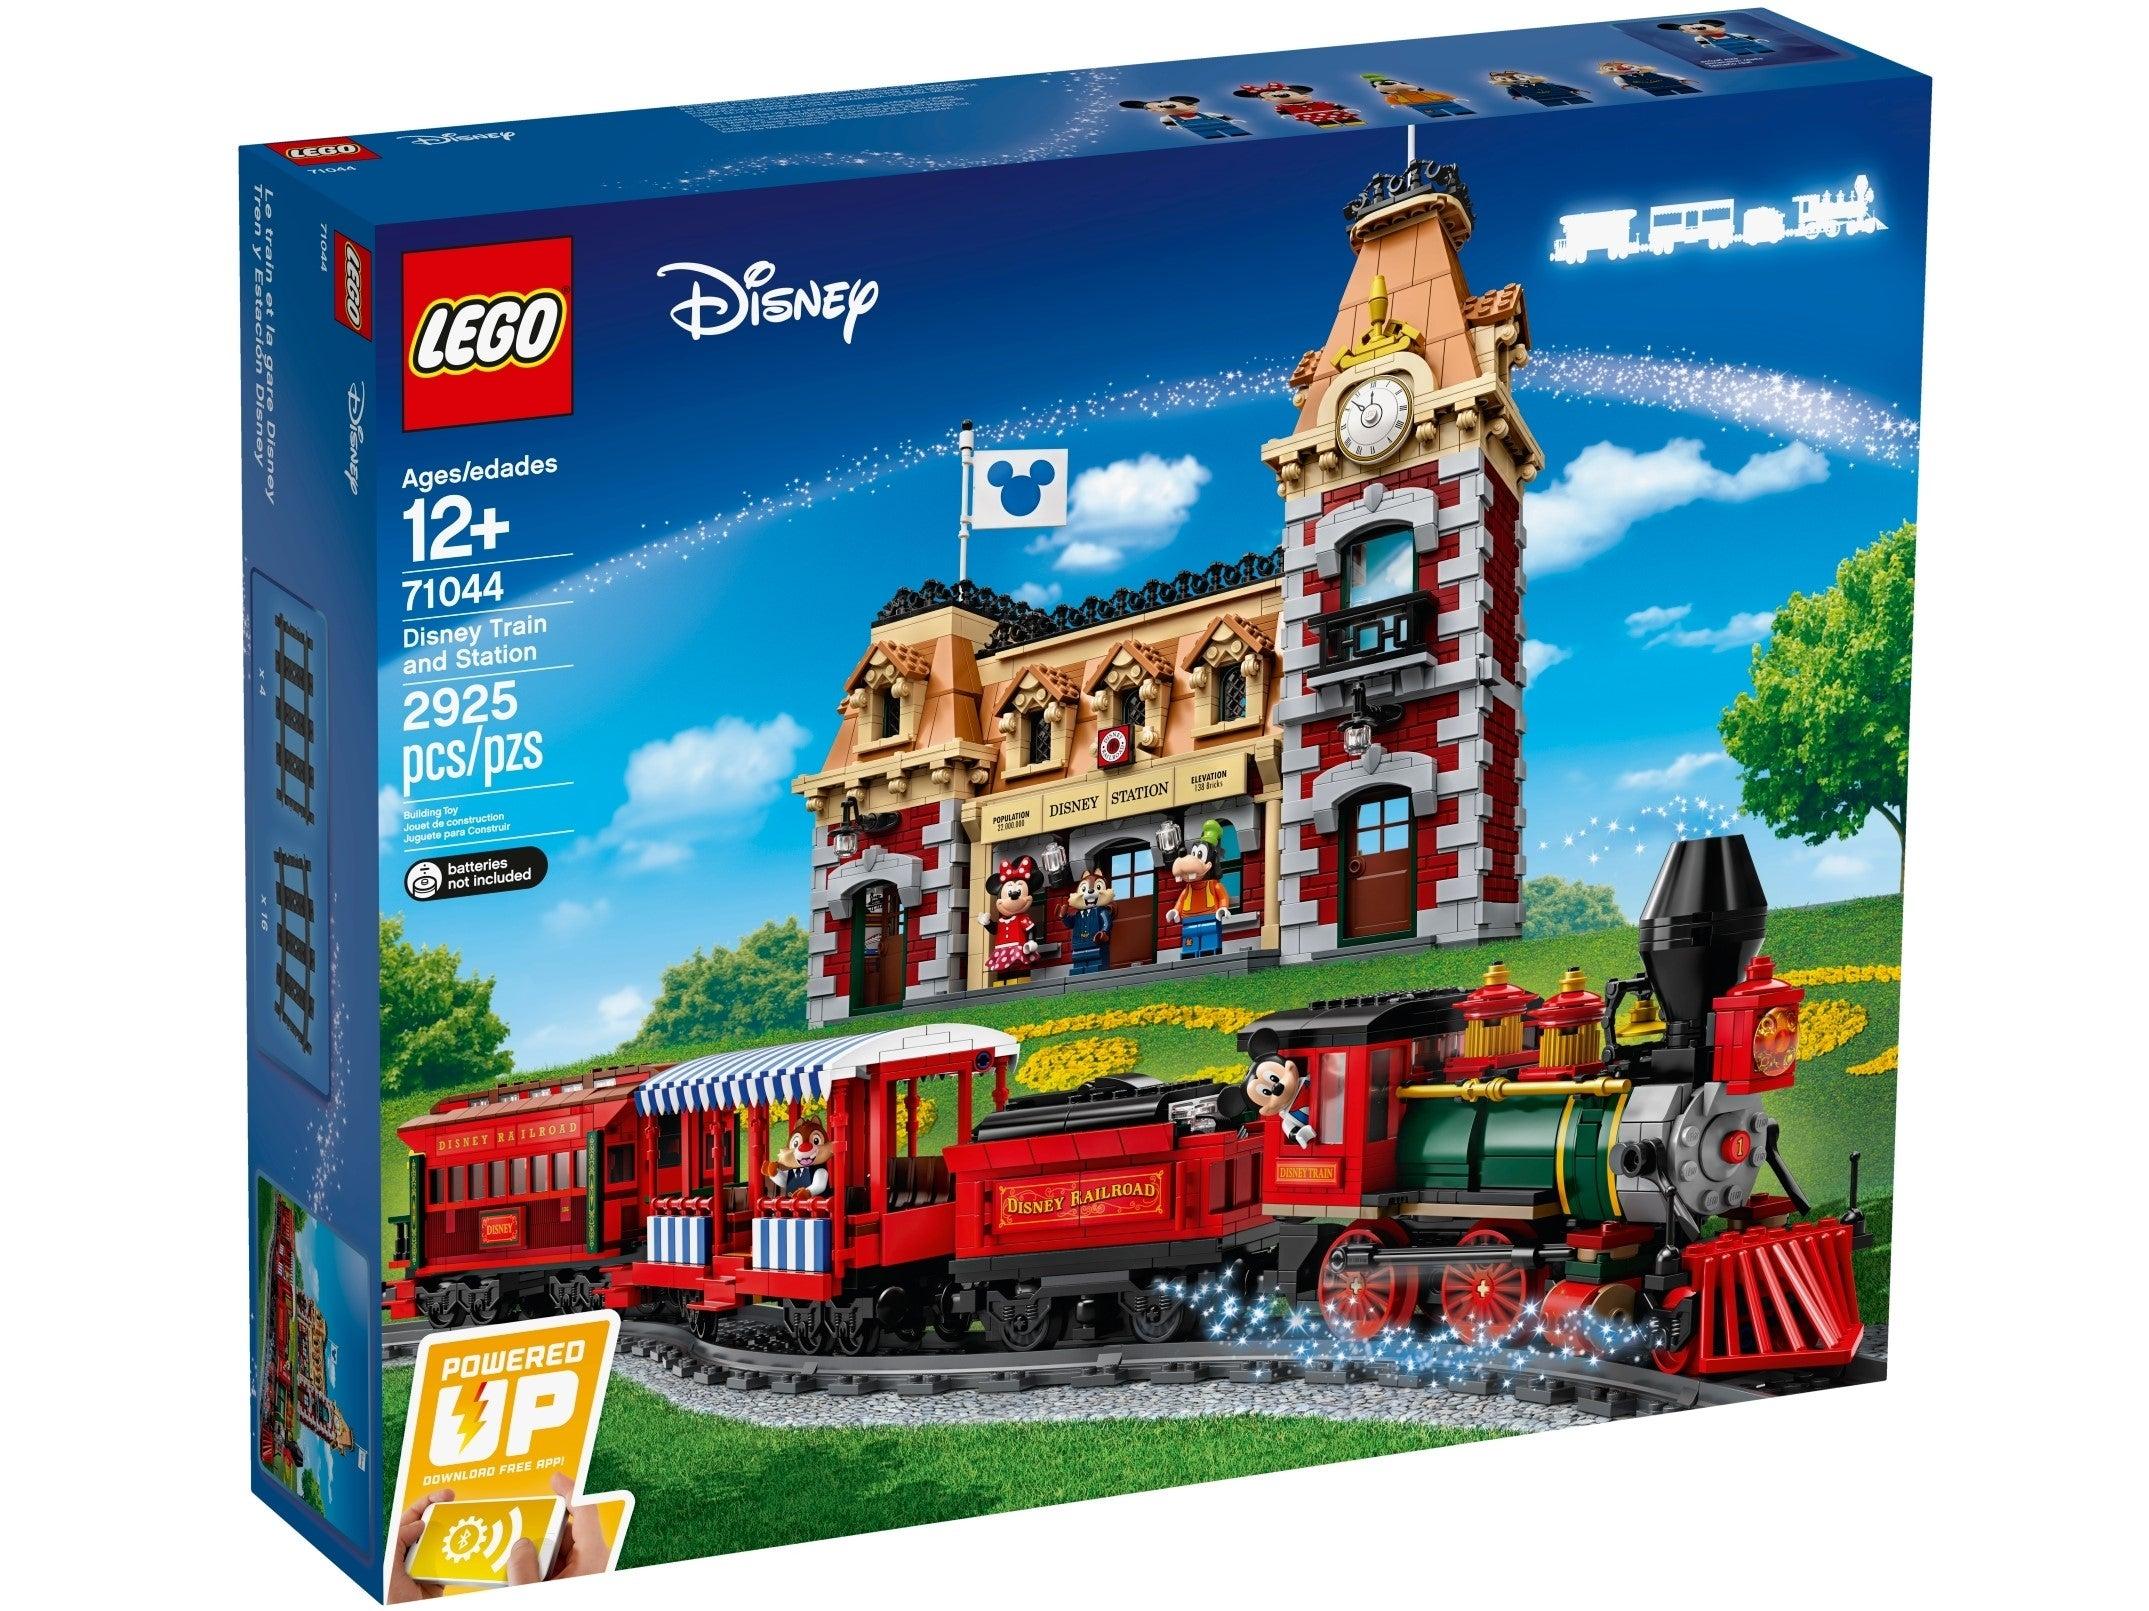 LEGO City Passenger Train LUXURY Locomotive Double Power Up Train Motor In 71044